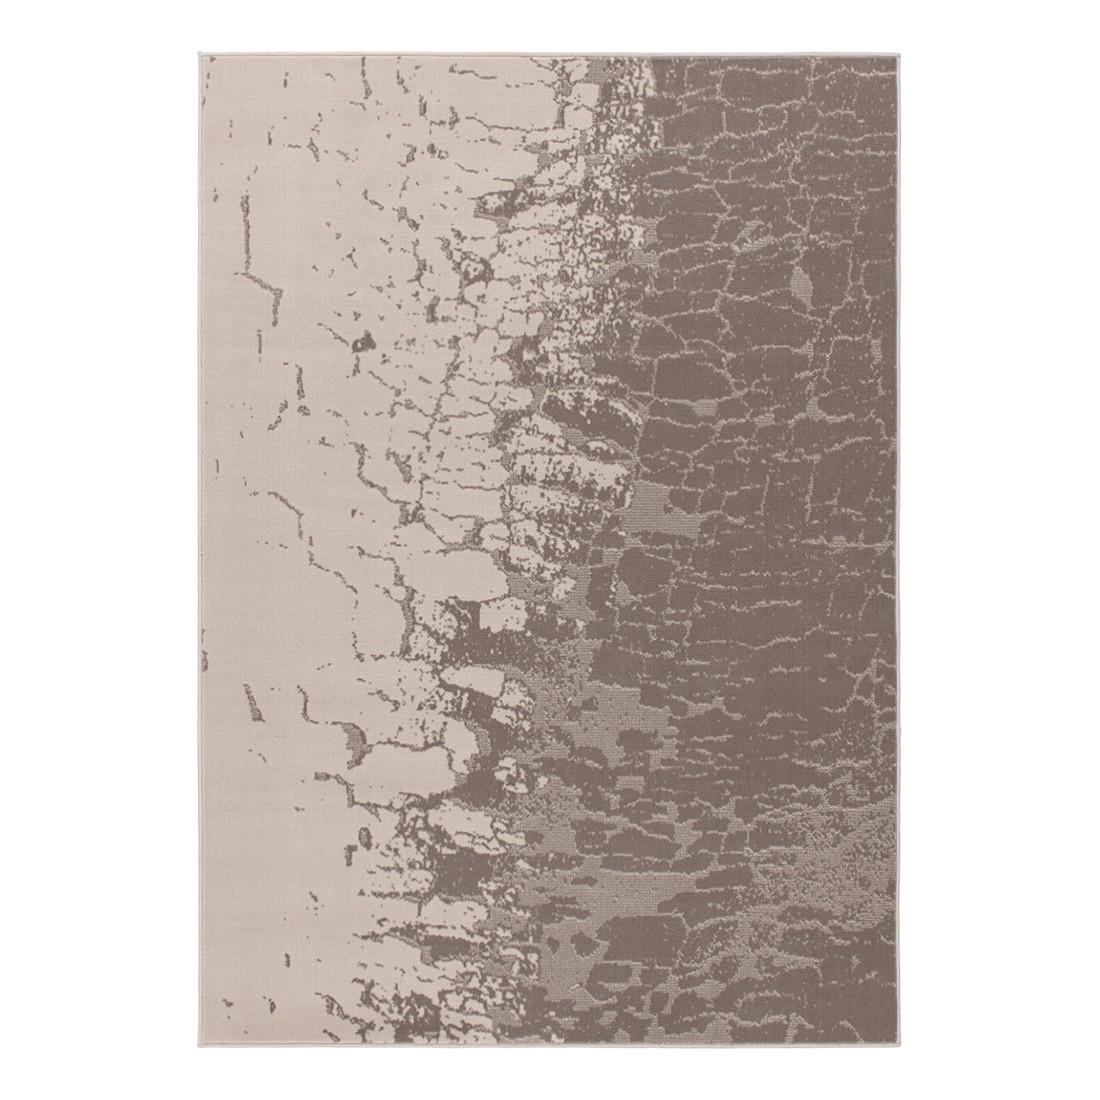 Teppich USA – Philadelphia – Beige/Braun – 160 x 230 cm, Kayoom jetzt kaufen